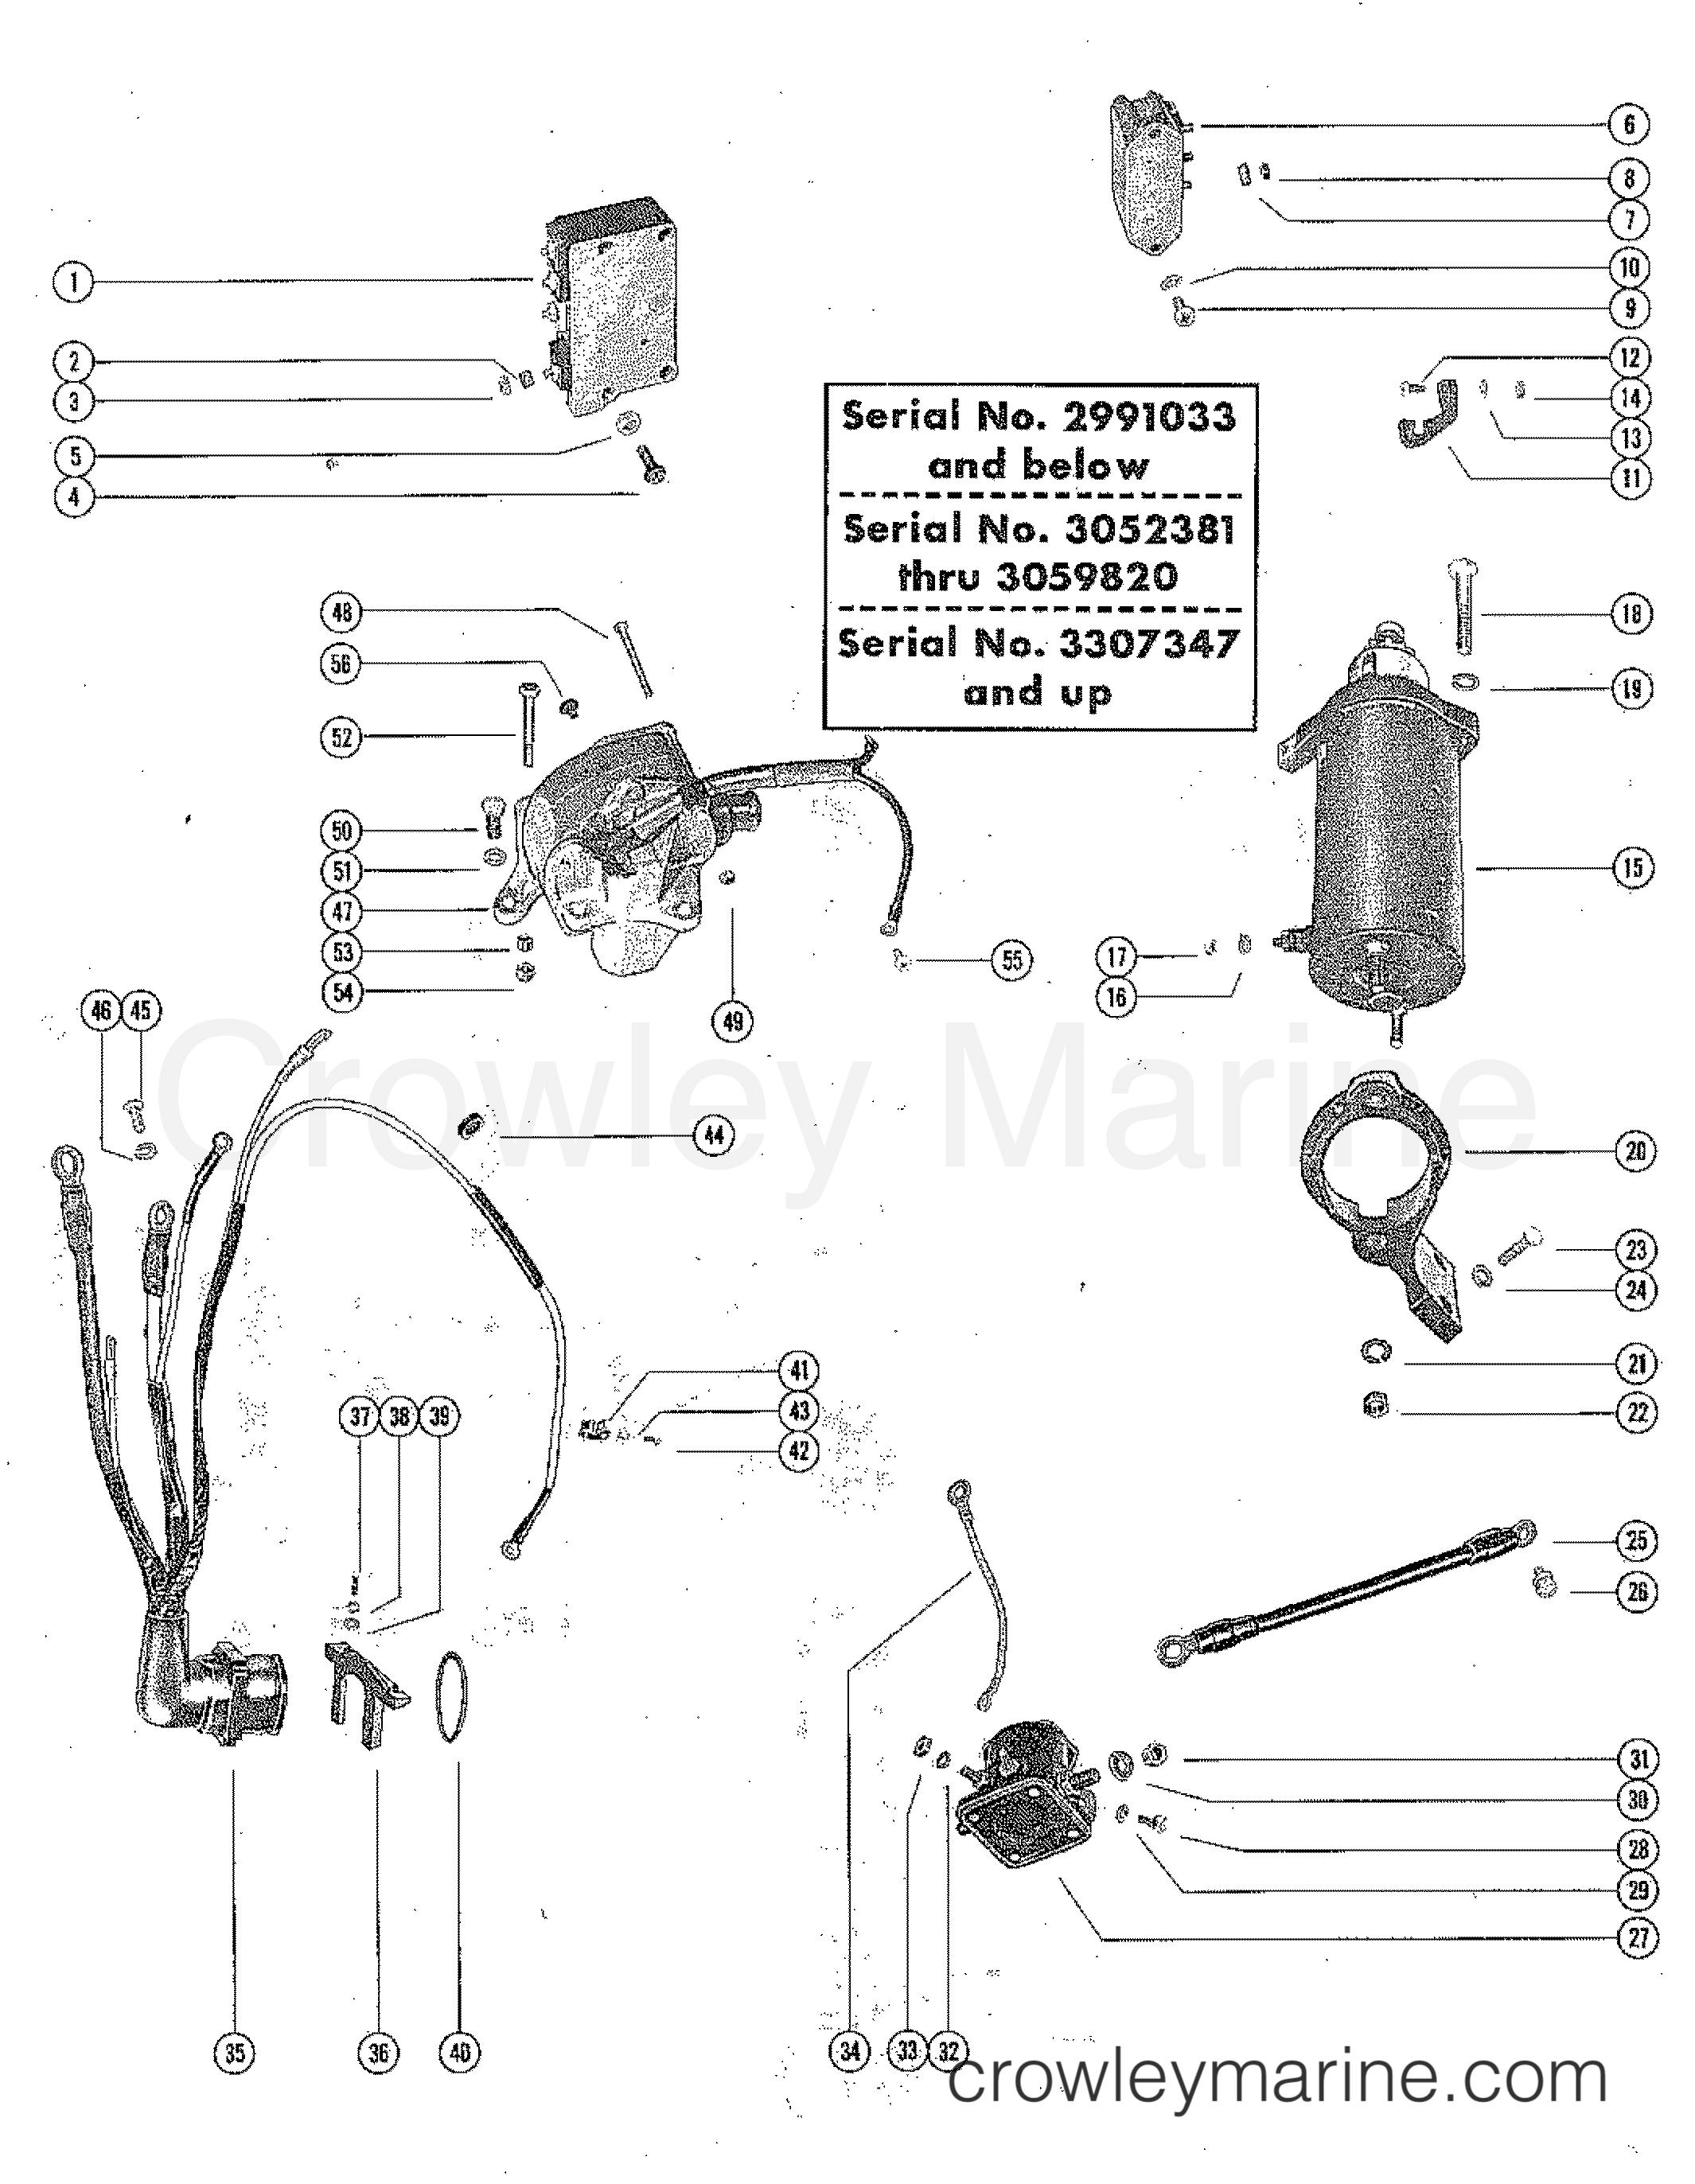 4 Cylinder Mercruiser Wiring Harness Diagram